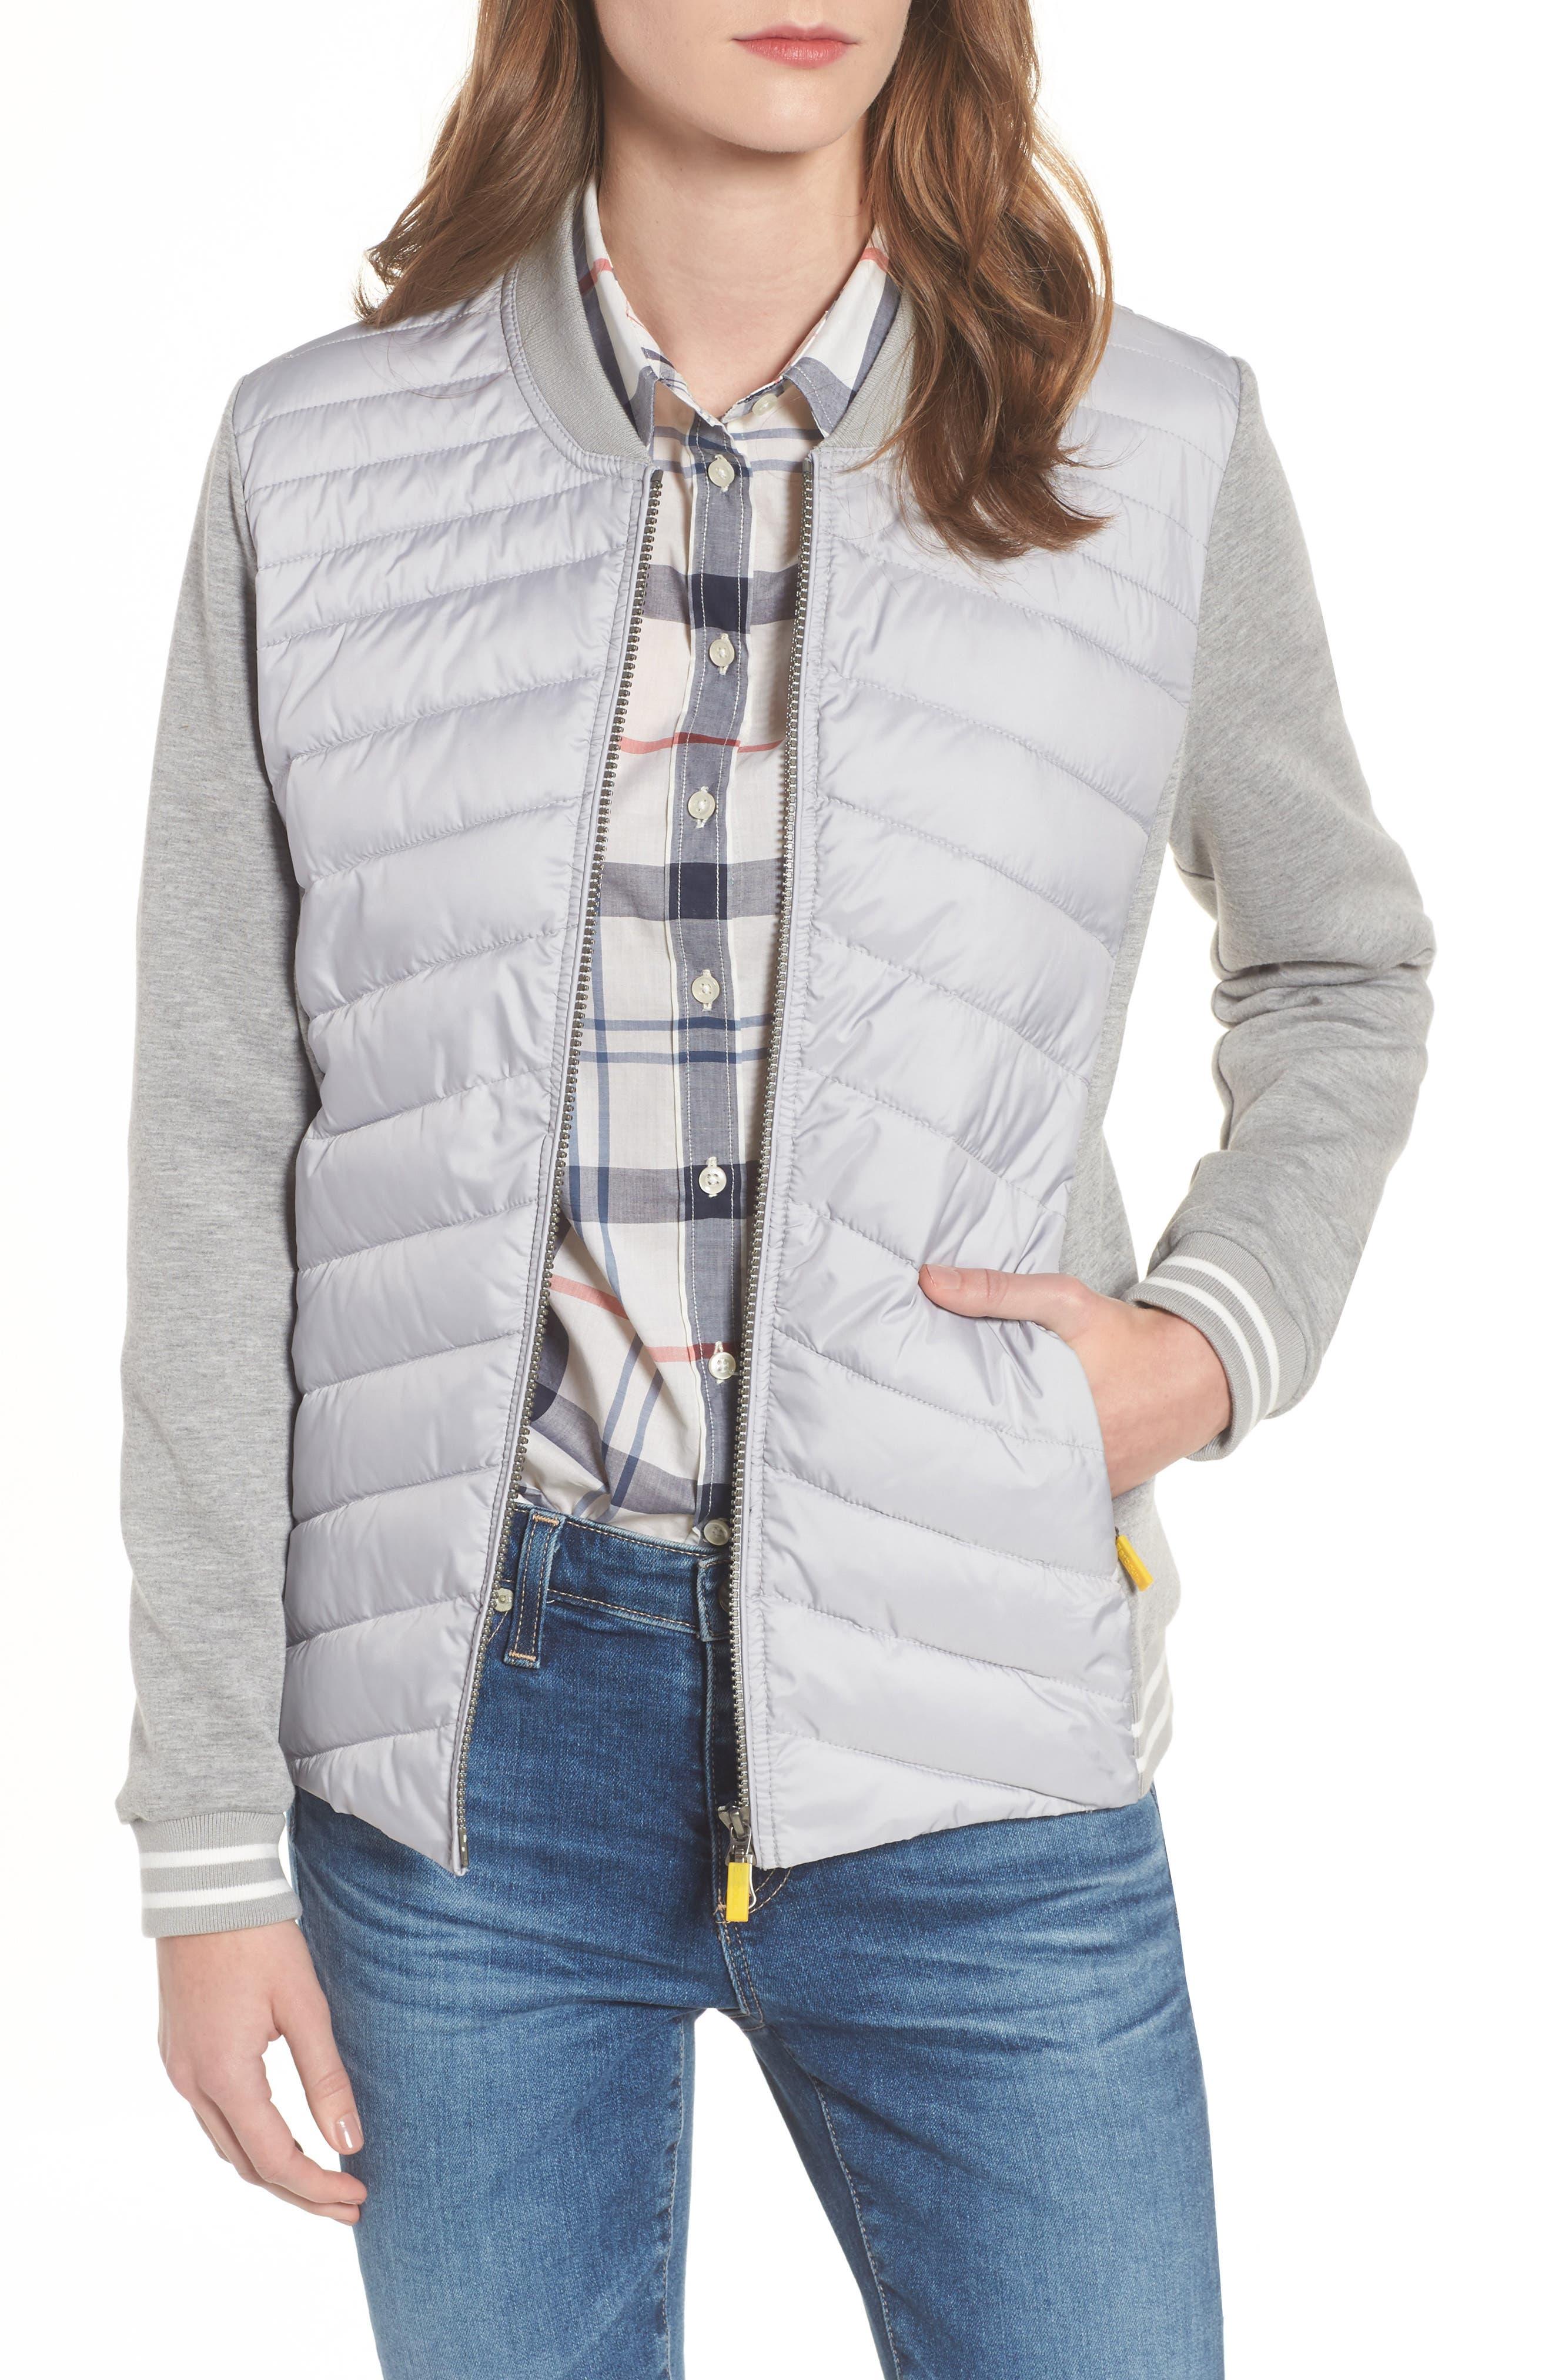 Pembrey Sweatshirt Jacket,                         Main,                         color, Ice White